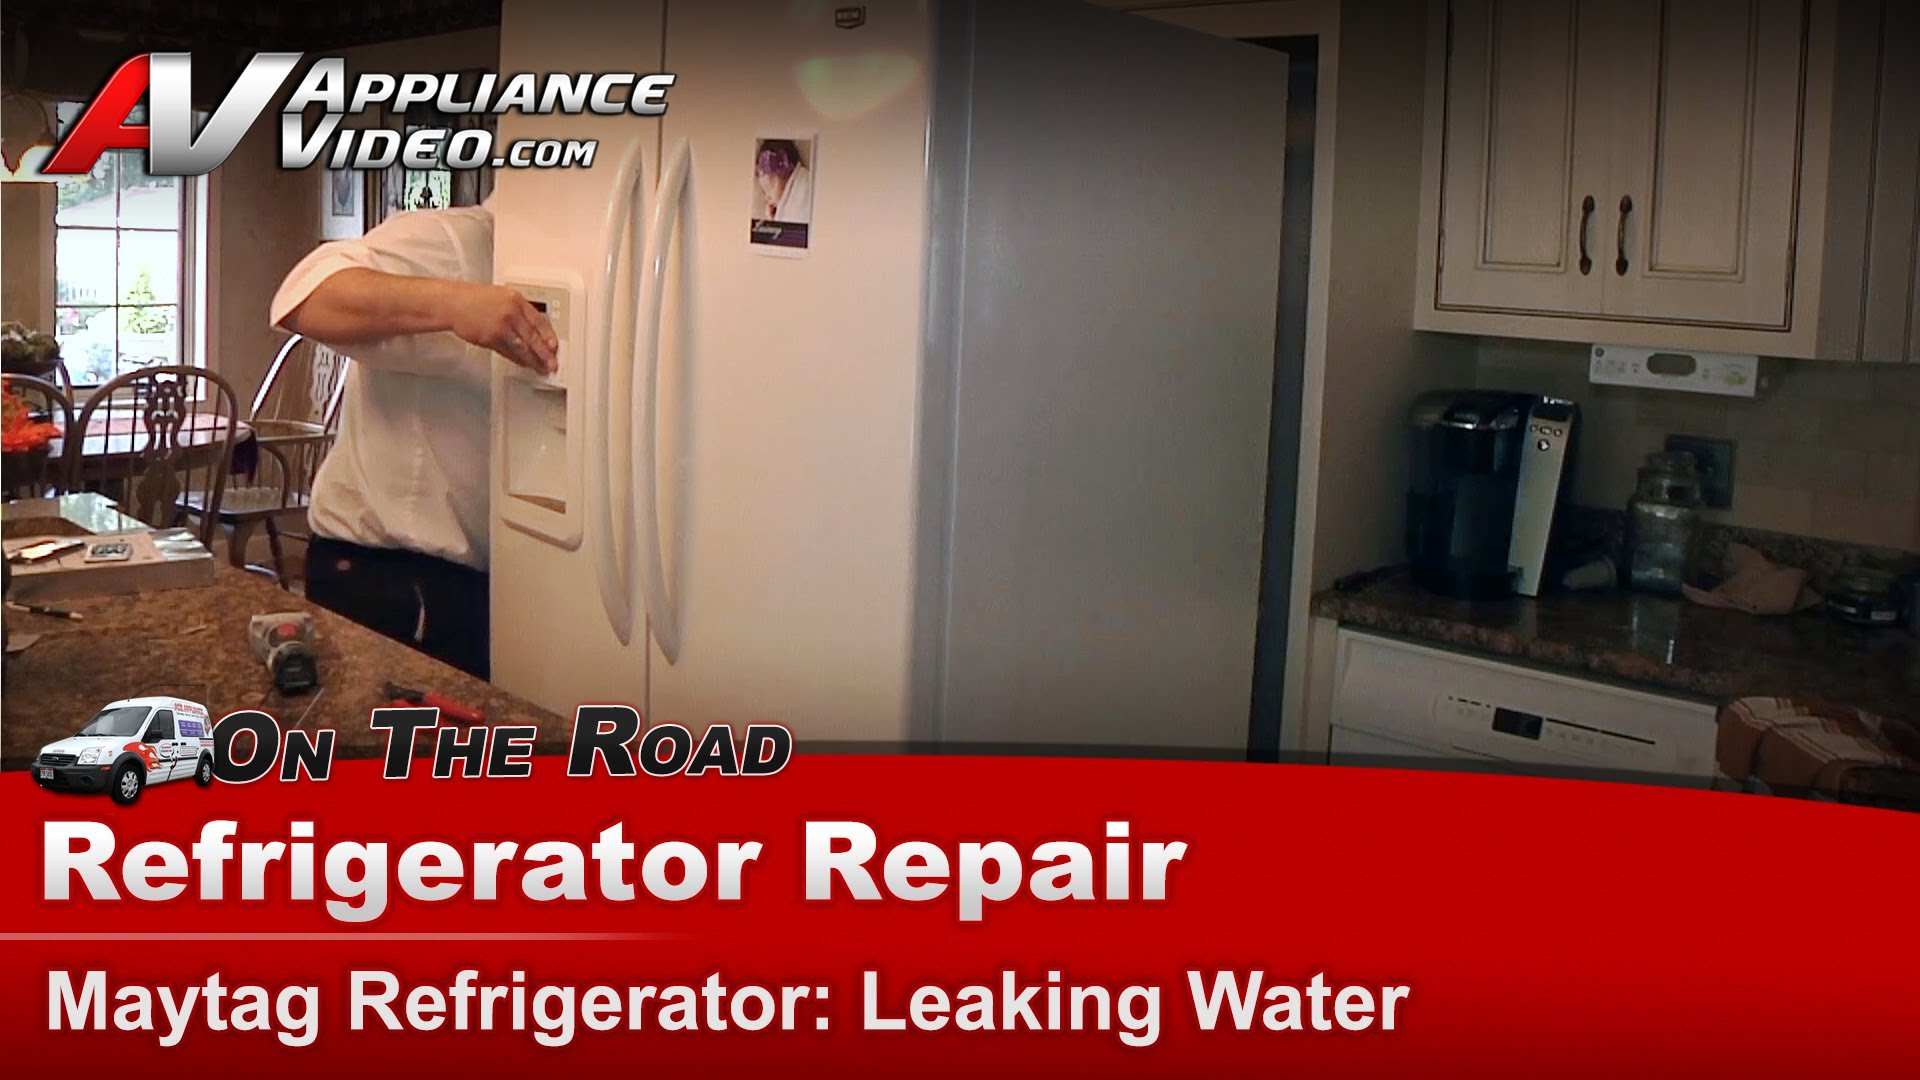 Maytag Mf12569veq2 Refrigerator Repair Leaking Water